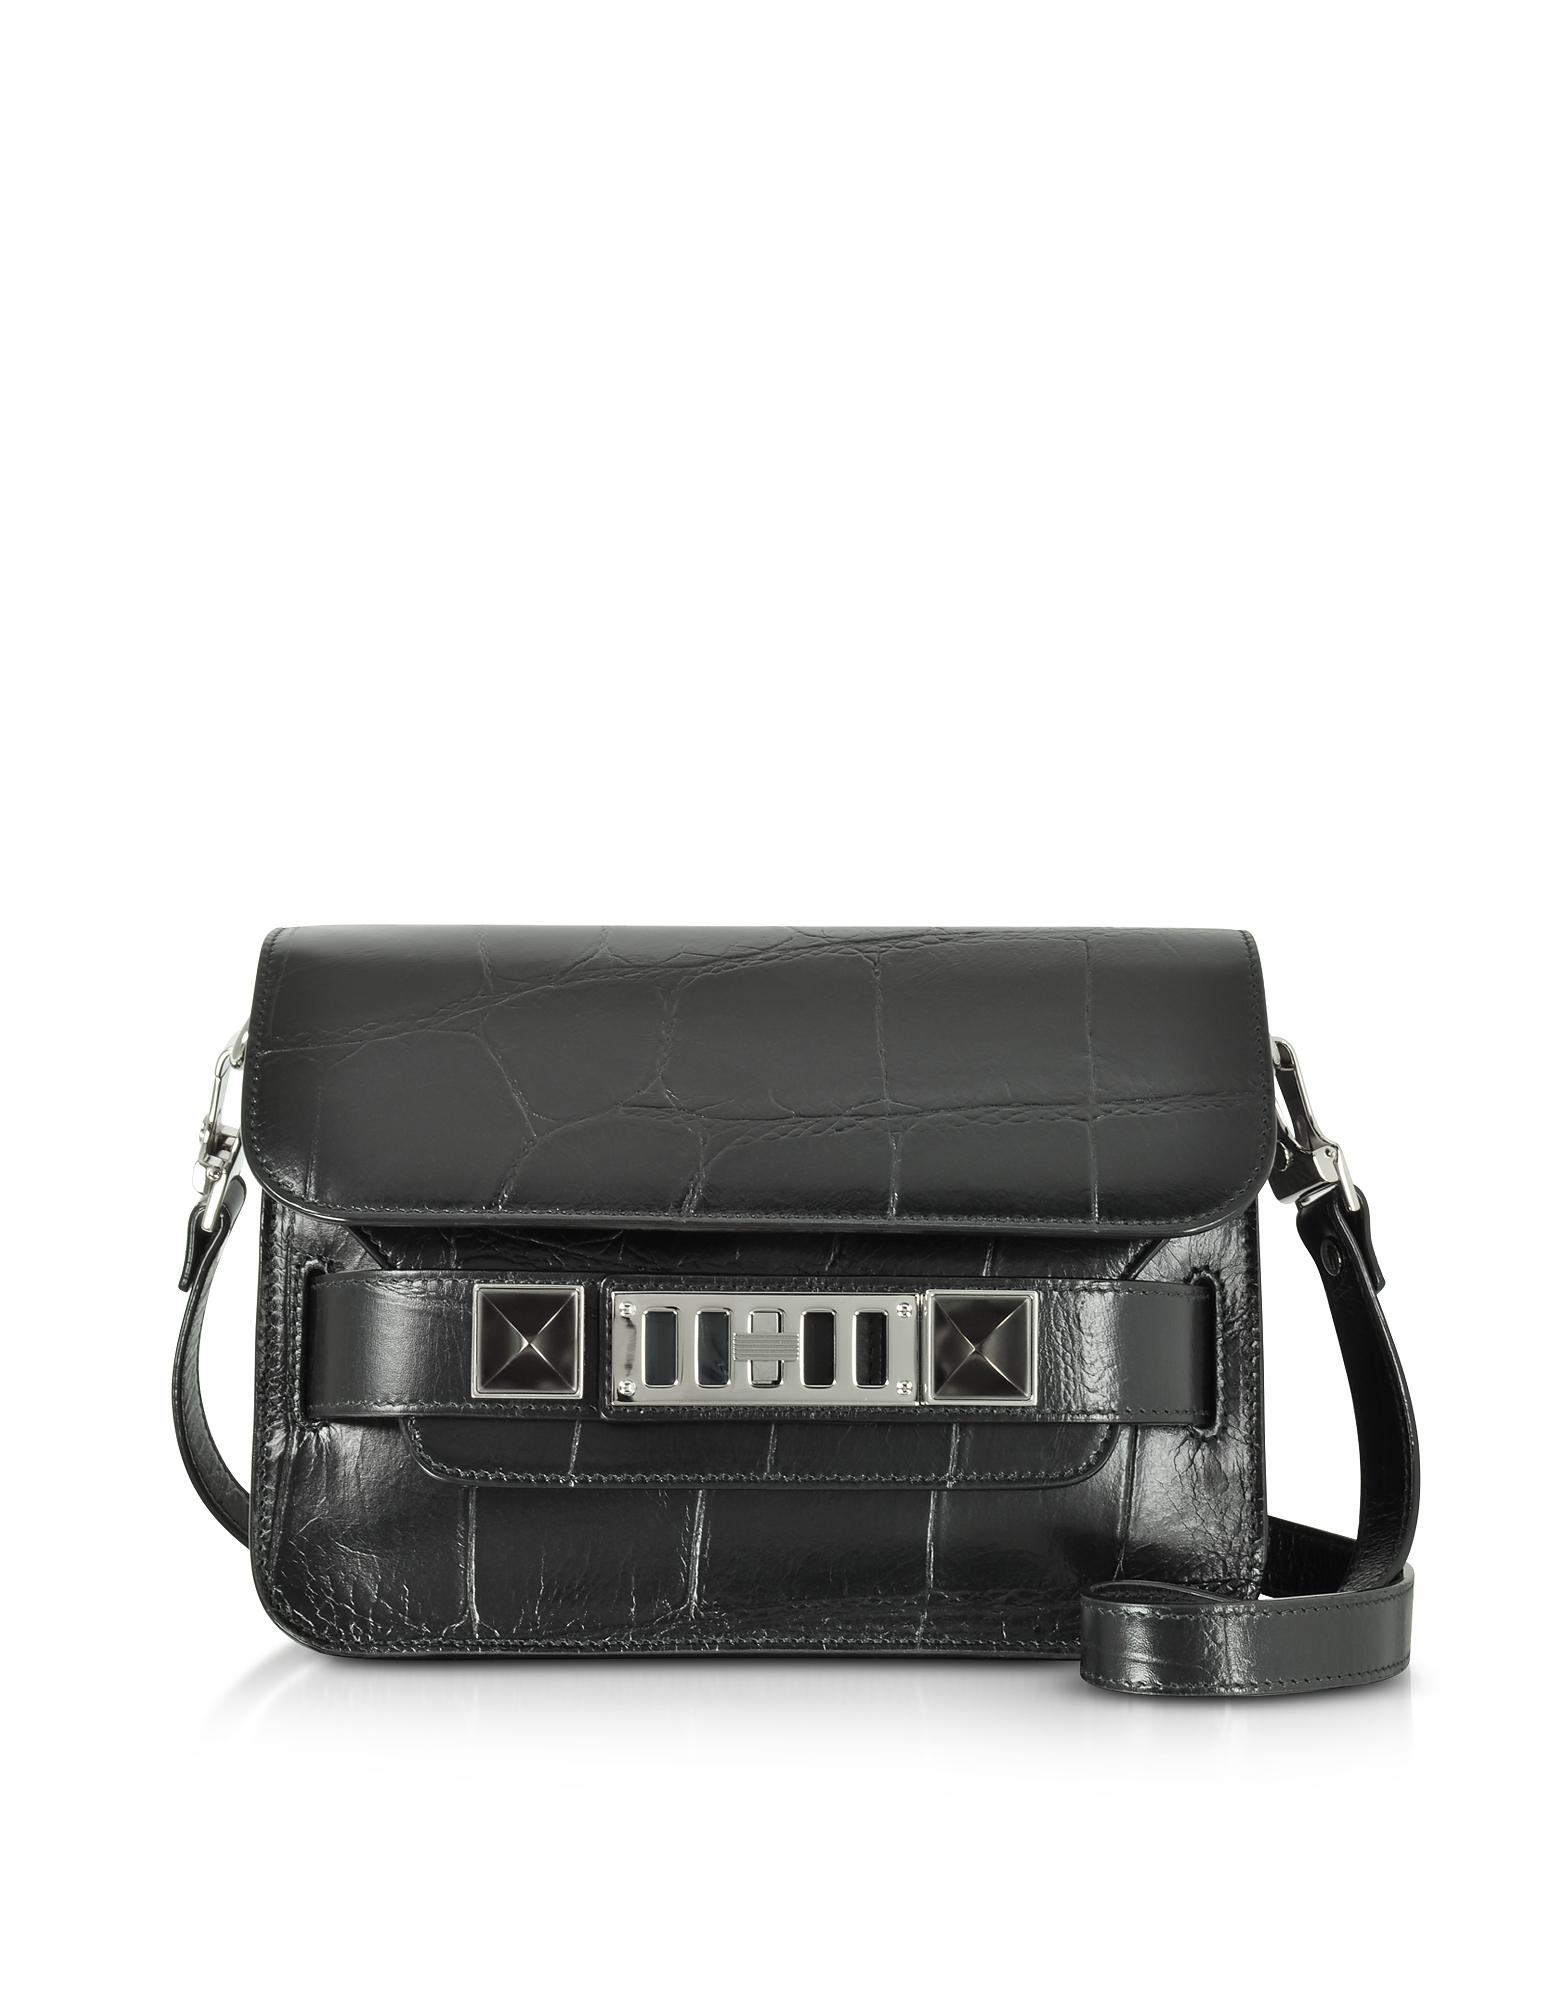 Ps11 Crossbody Bag in Black Embossed Giant Croc Leather Proenza Schouler 545kju